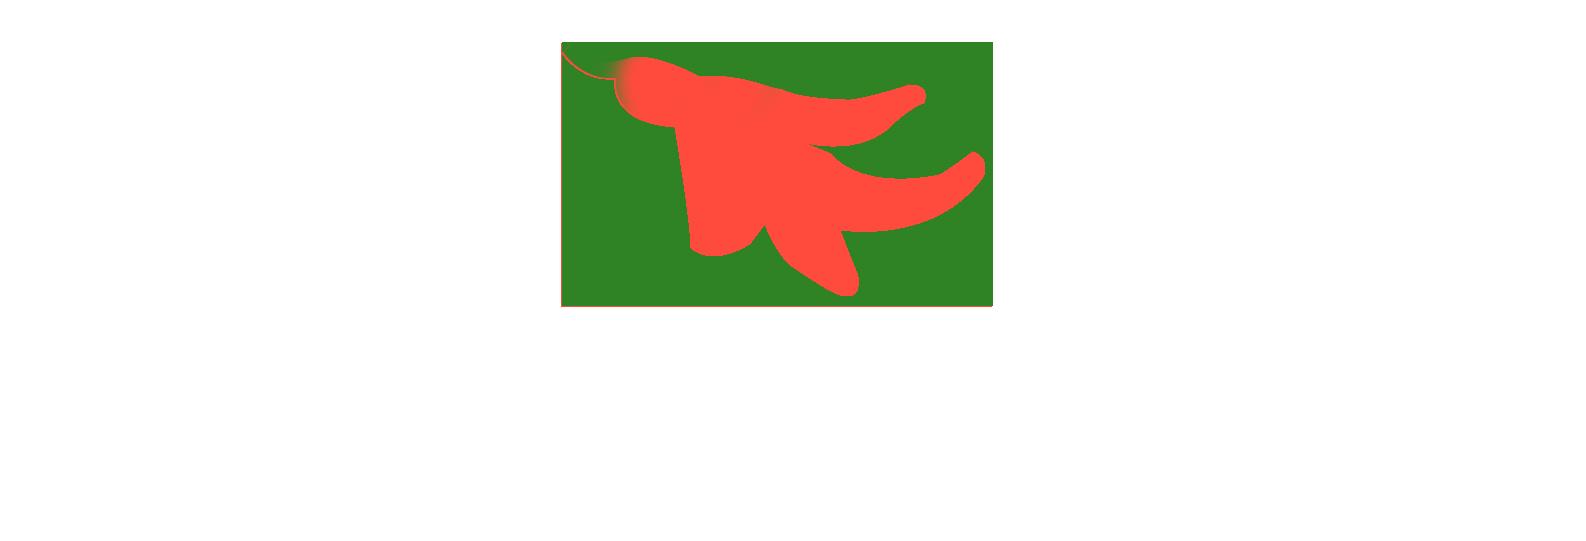 Cocina plancha